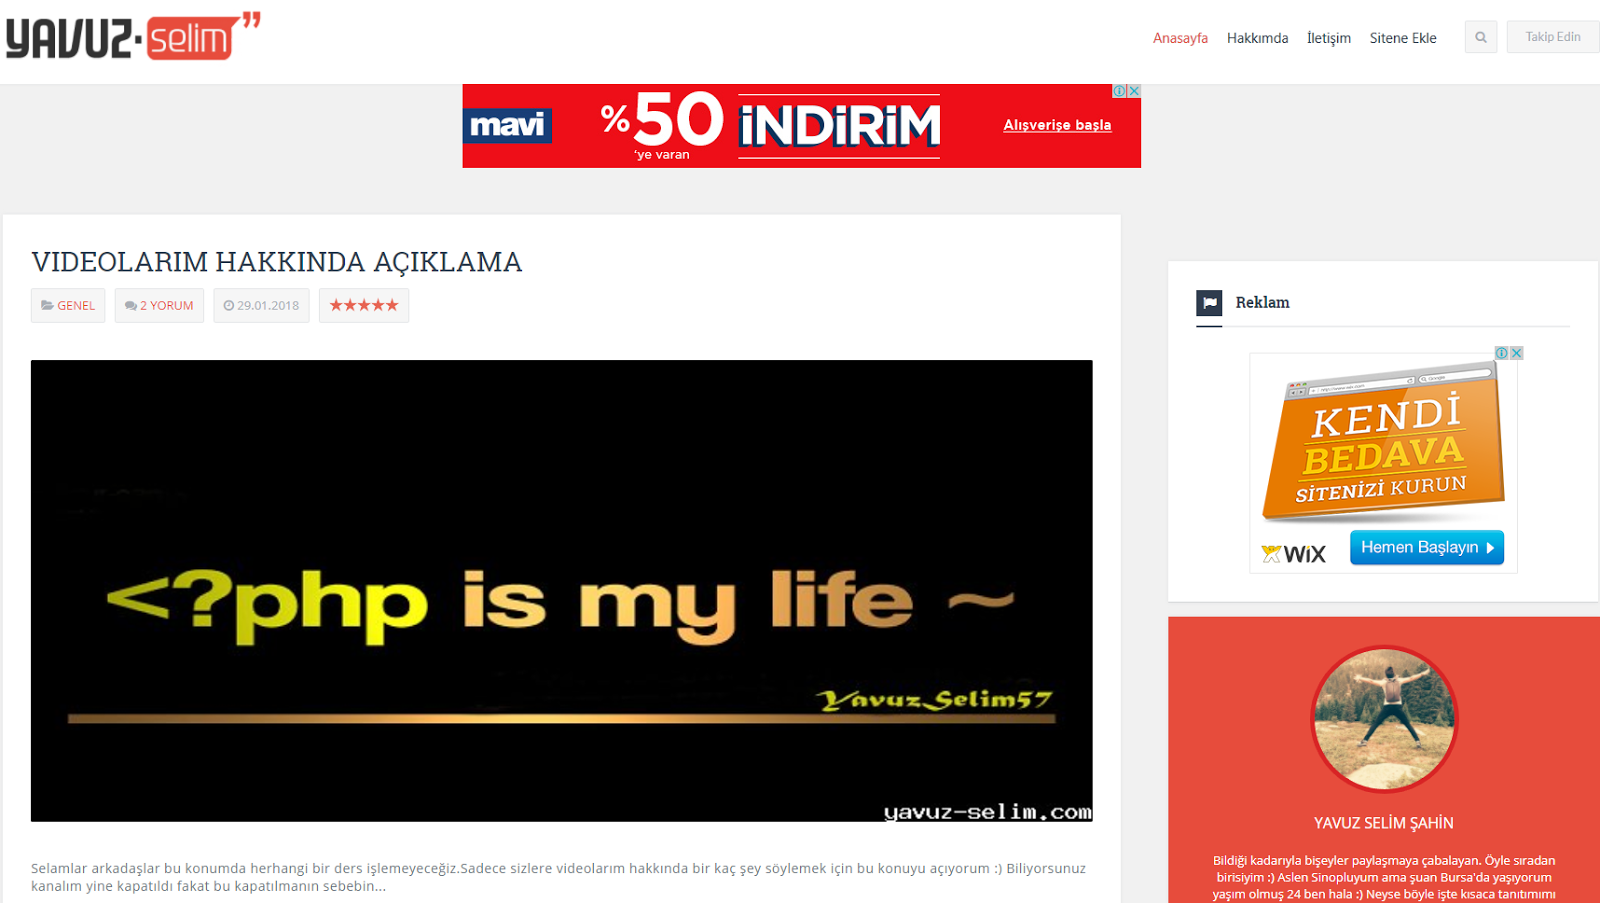 Yavuz Selim Röportaj tamamladım